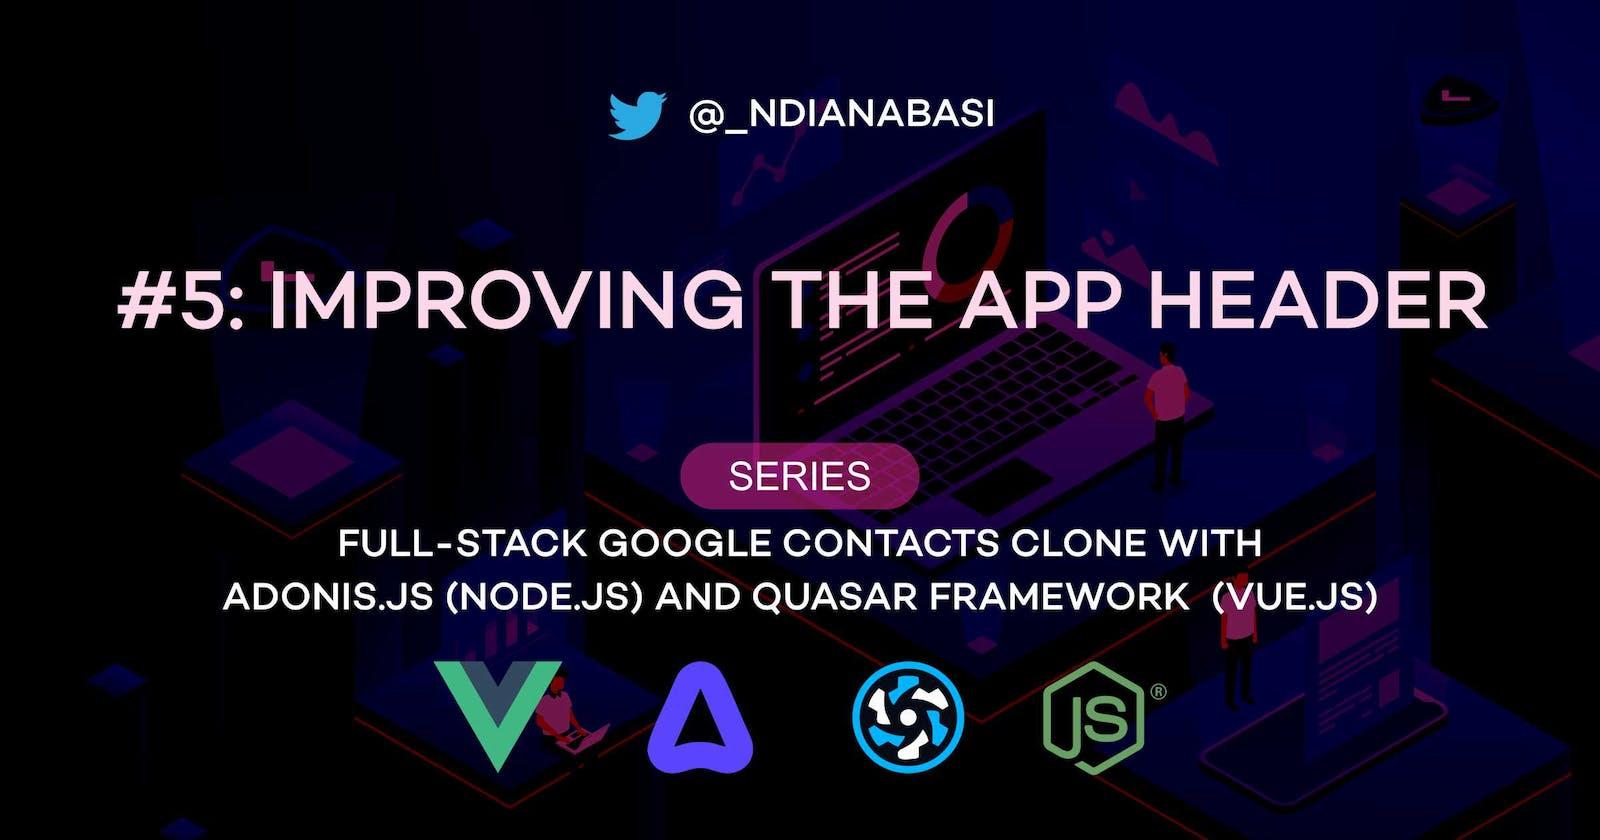 Improve The Header   Full-Stack Google Contacts Clone with Adonis.js/Node.js and Quasar (Vue.js)